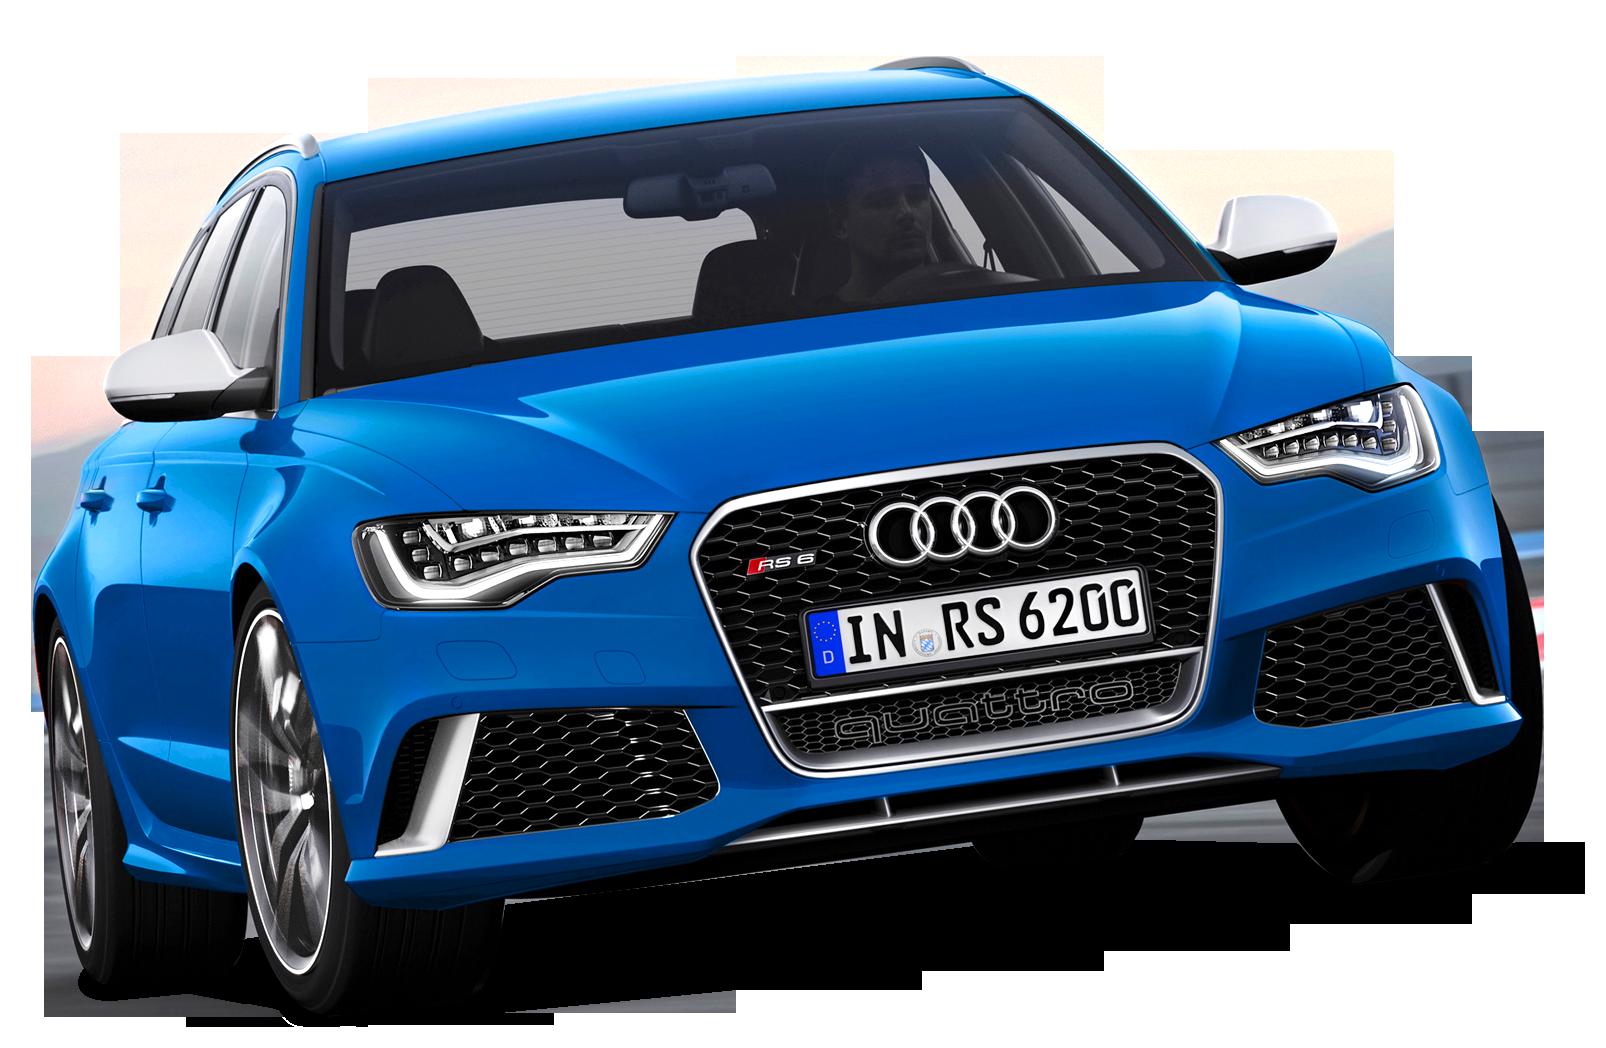 Audi clipart #3, Download drawings